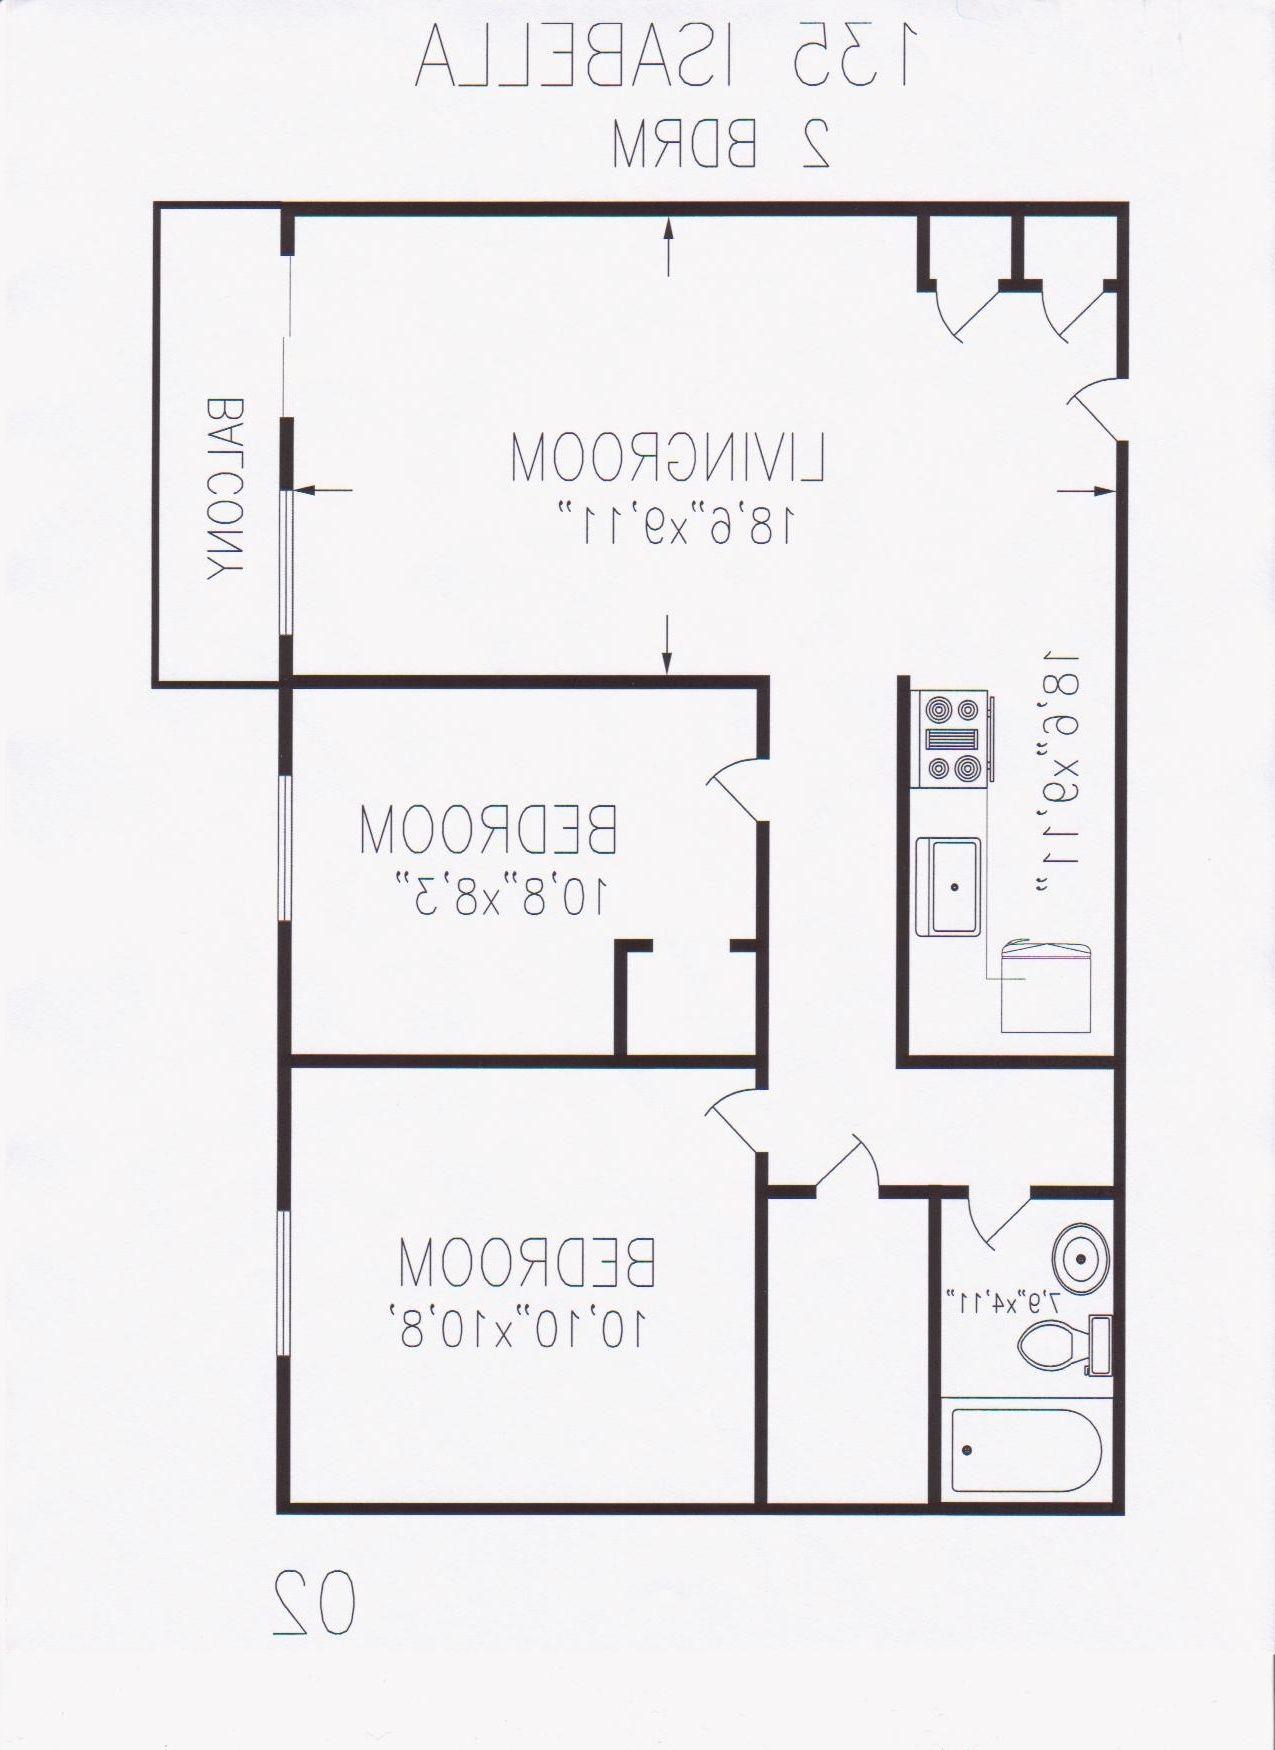 Small house plans under sq ft  also buyinstagramslikescheap rh in pinterest